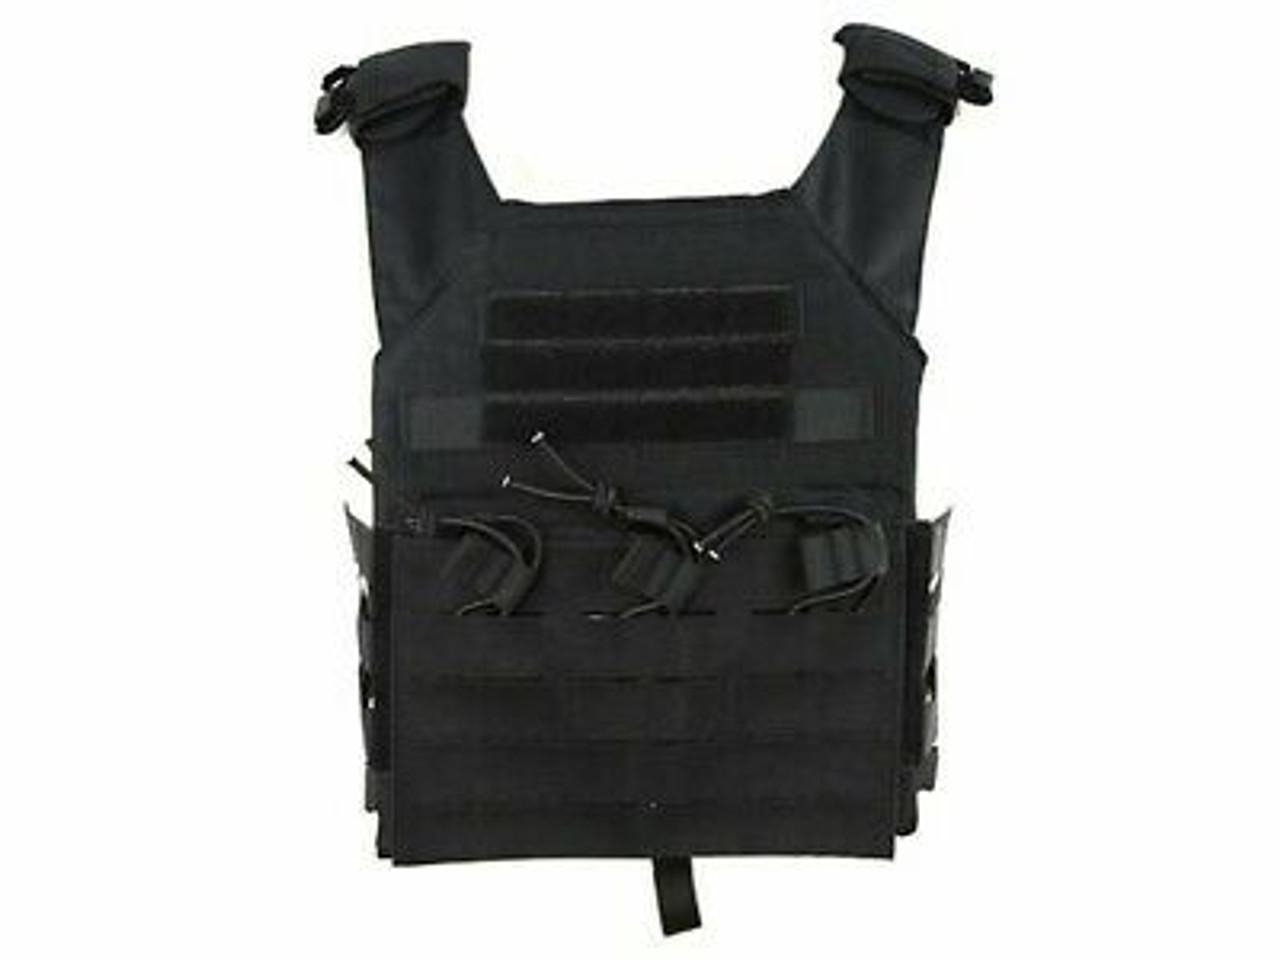 Big Foot JPC Tactical Vest Strengthened - Black